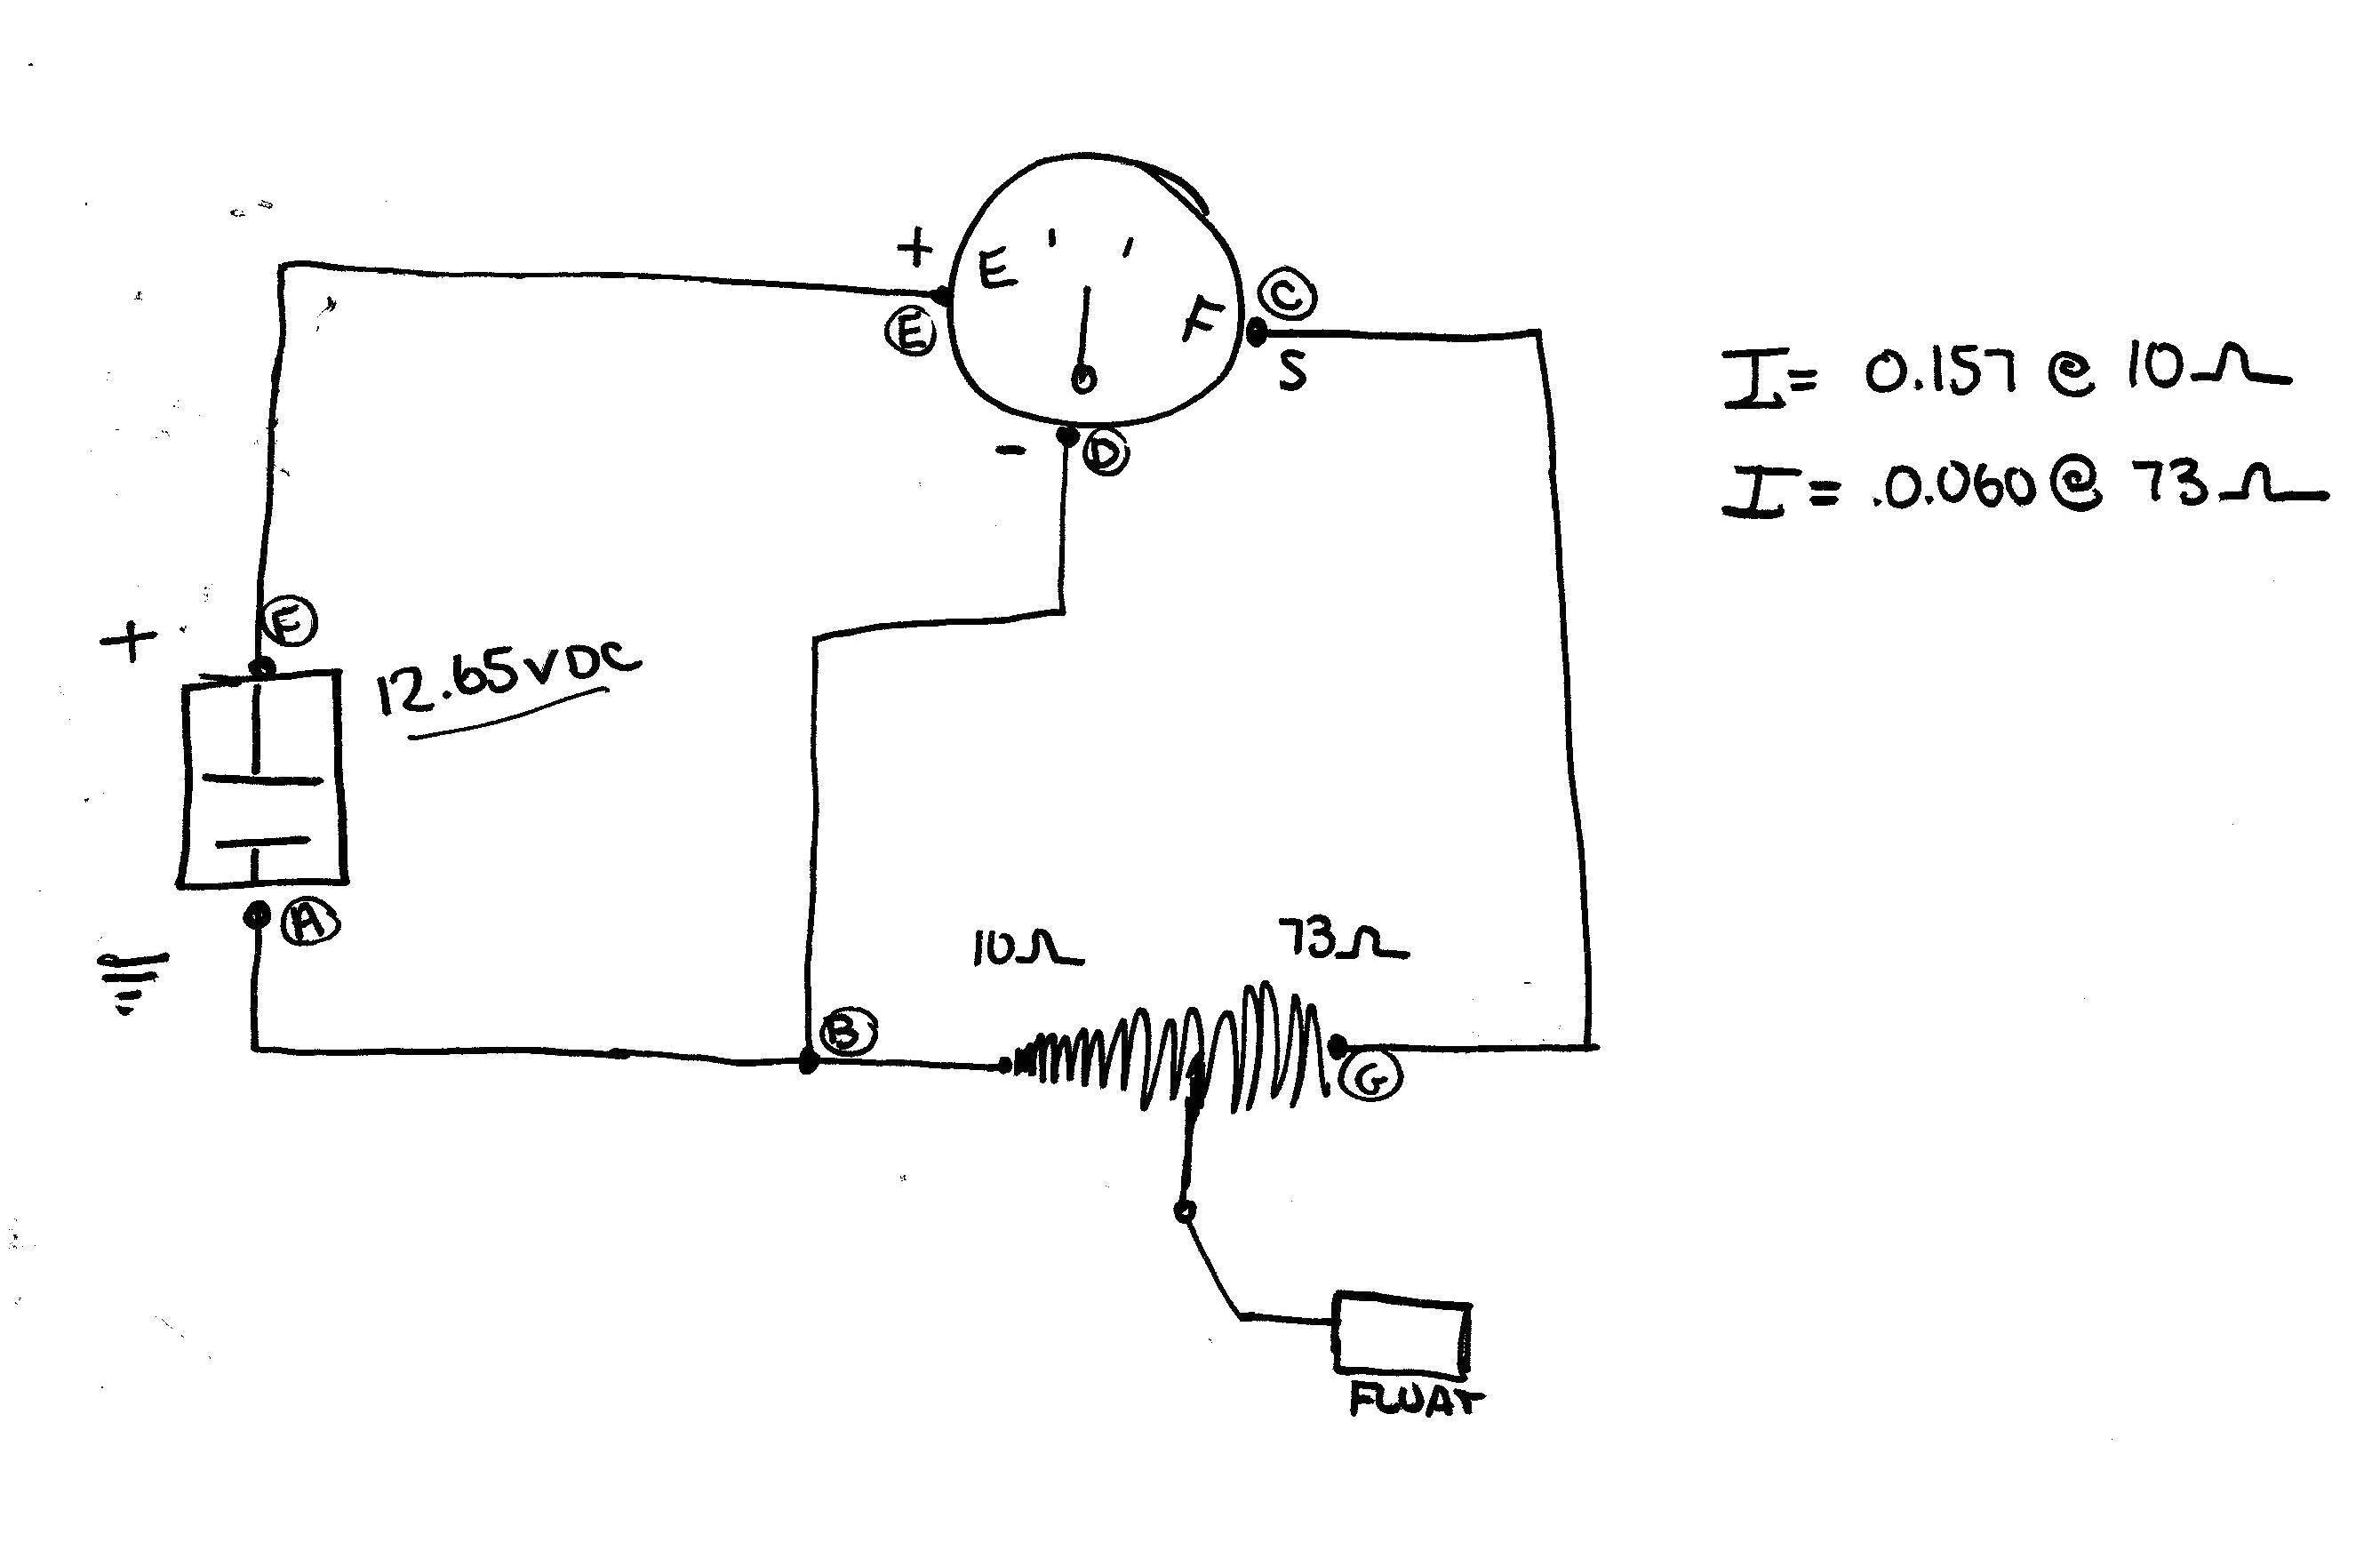 auto meter fuel gauge wiring diagram wiring diagram user auto meter fuel gauge wiring diagram